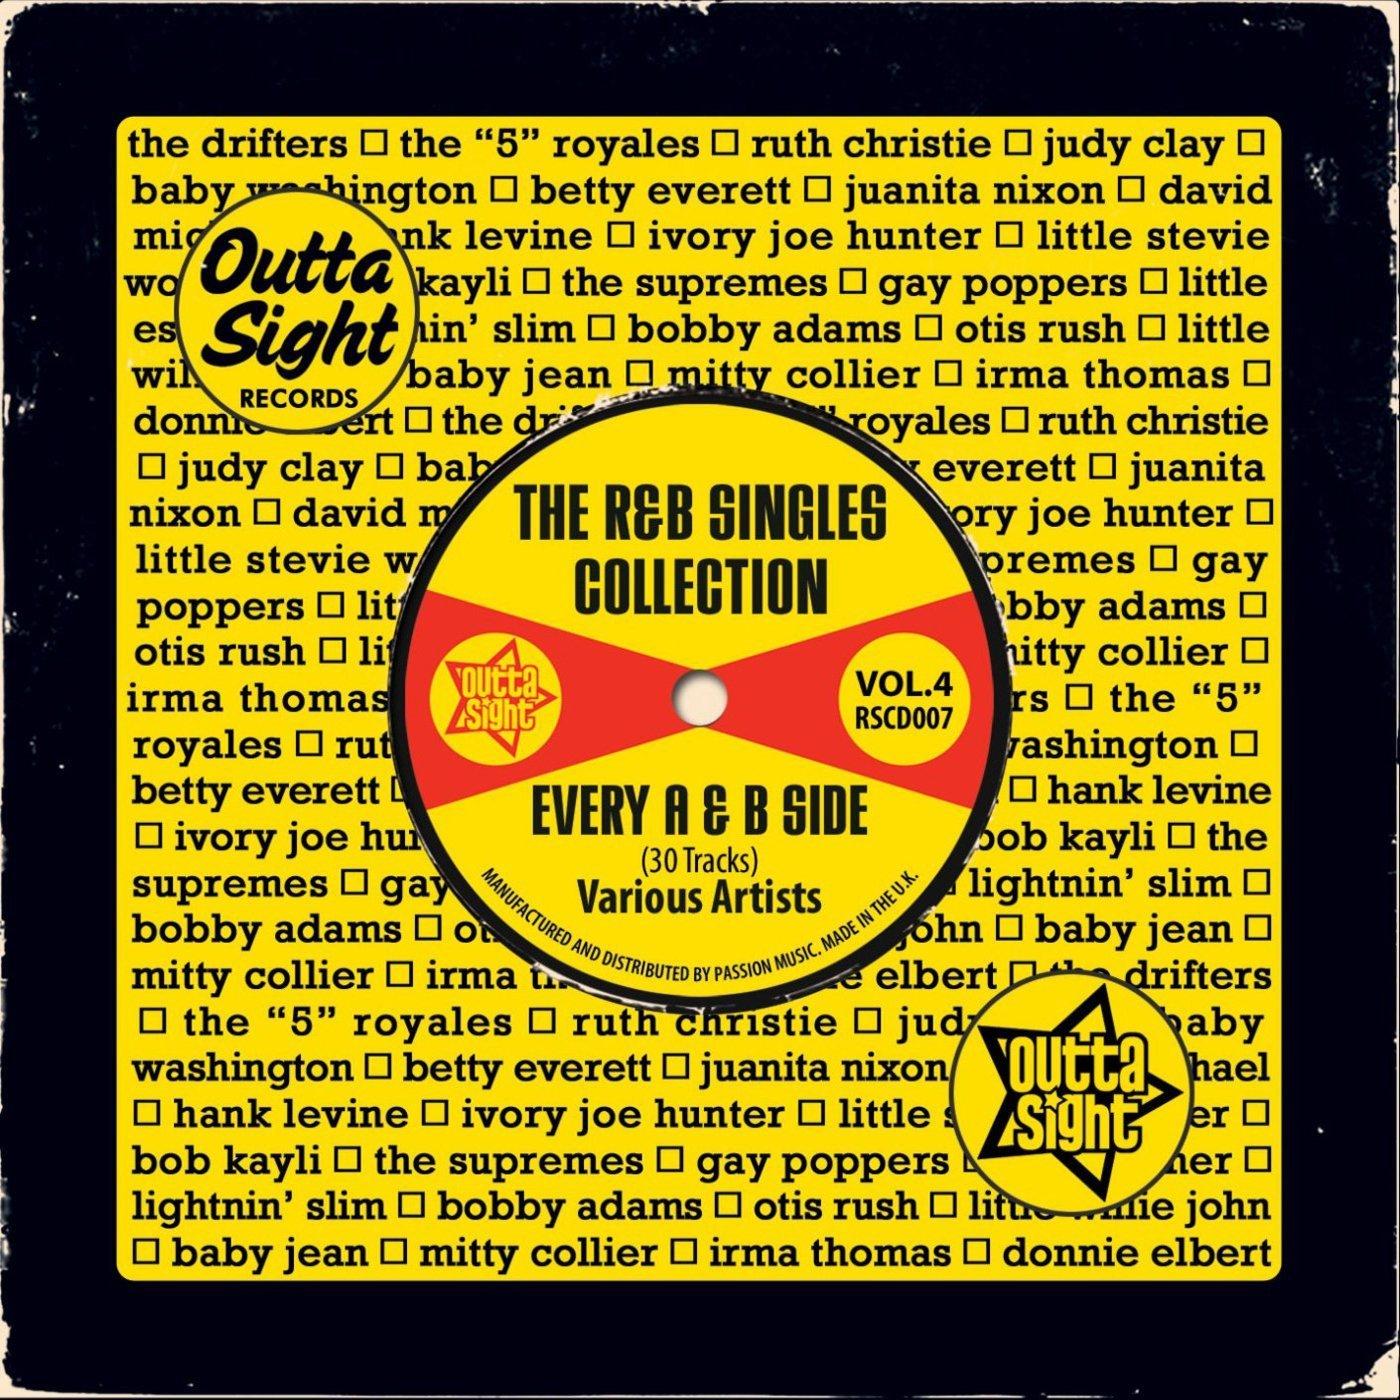 R&B Singles Collection Volume 4 CD